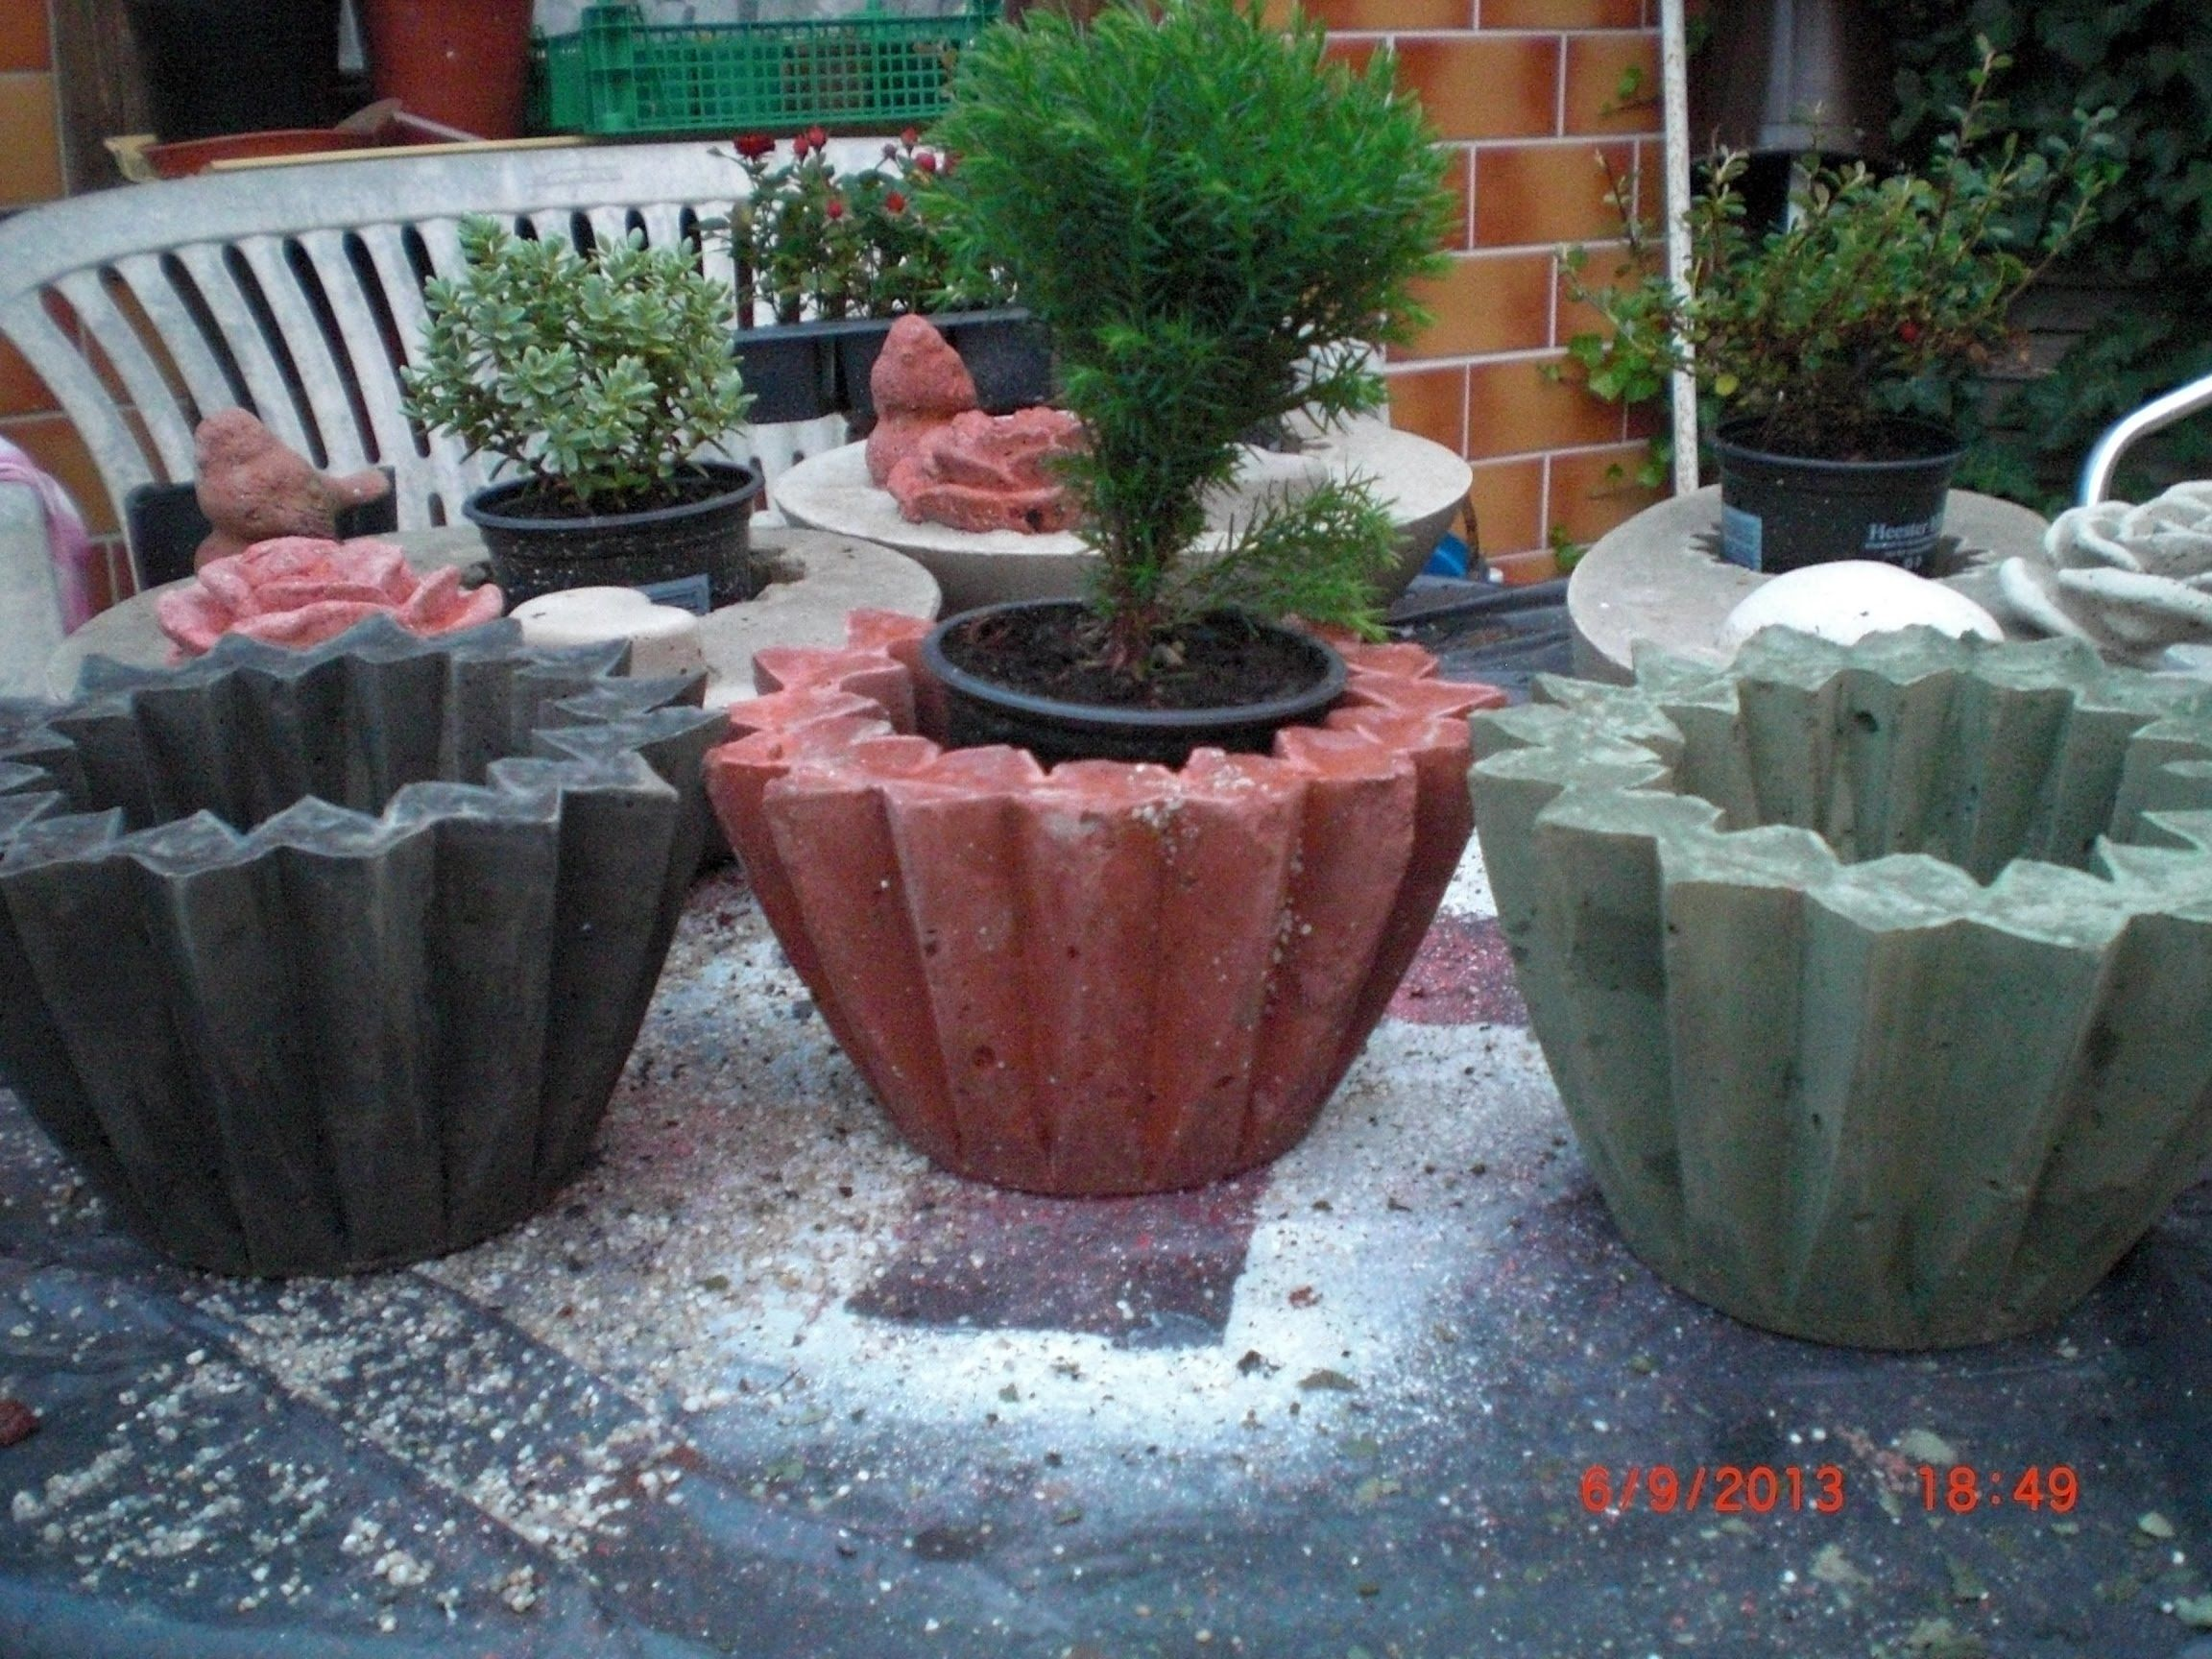 beton giessen beton einf rben mit farbpigmenten beton pinterest beton gie en beton. Black Bedroom Furniture Sets. Home Design Ideas